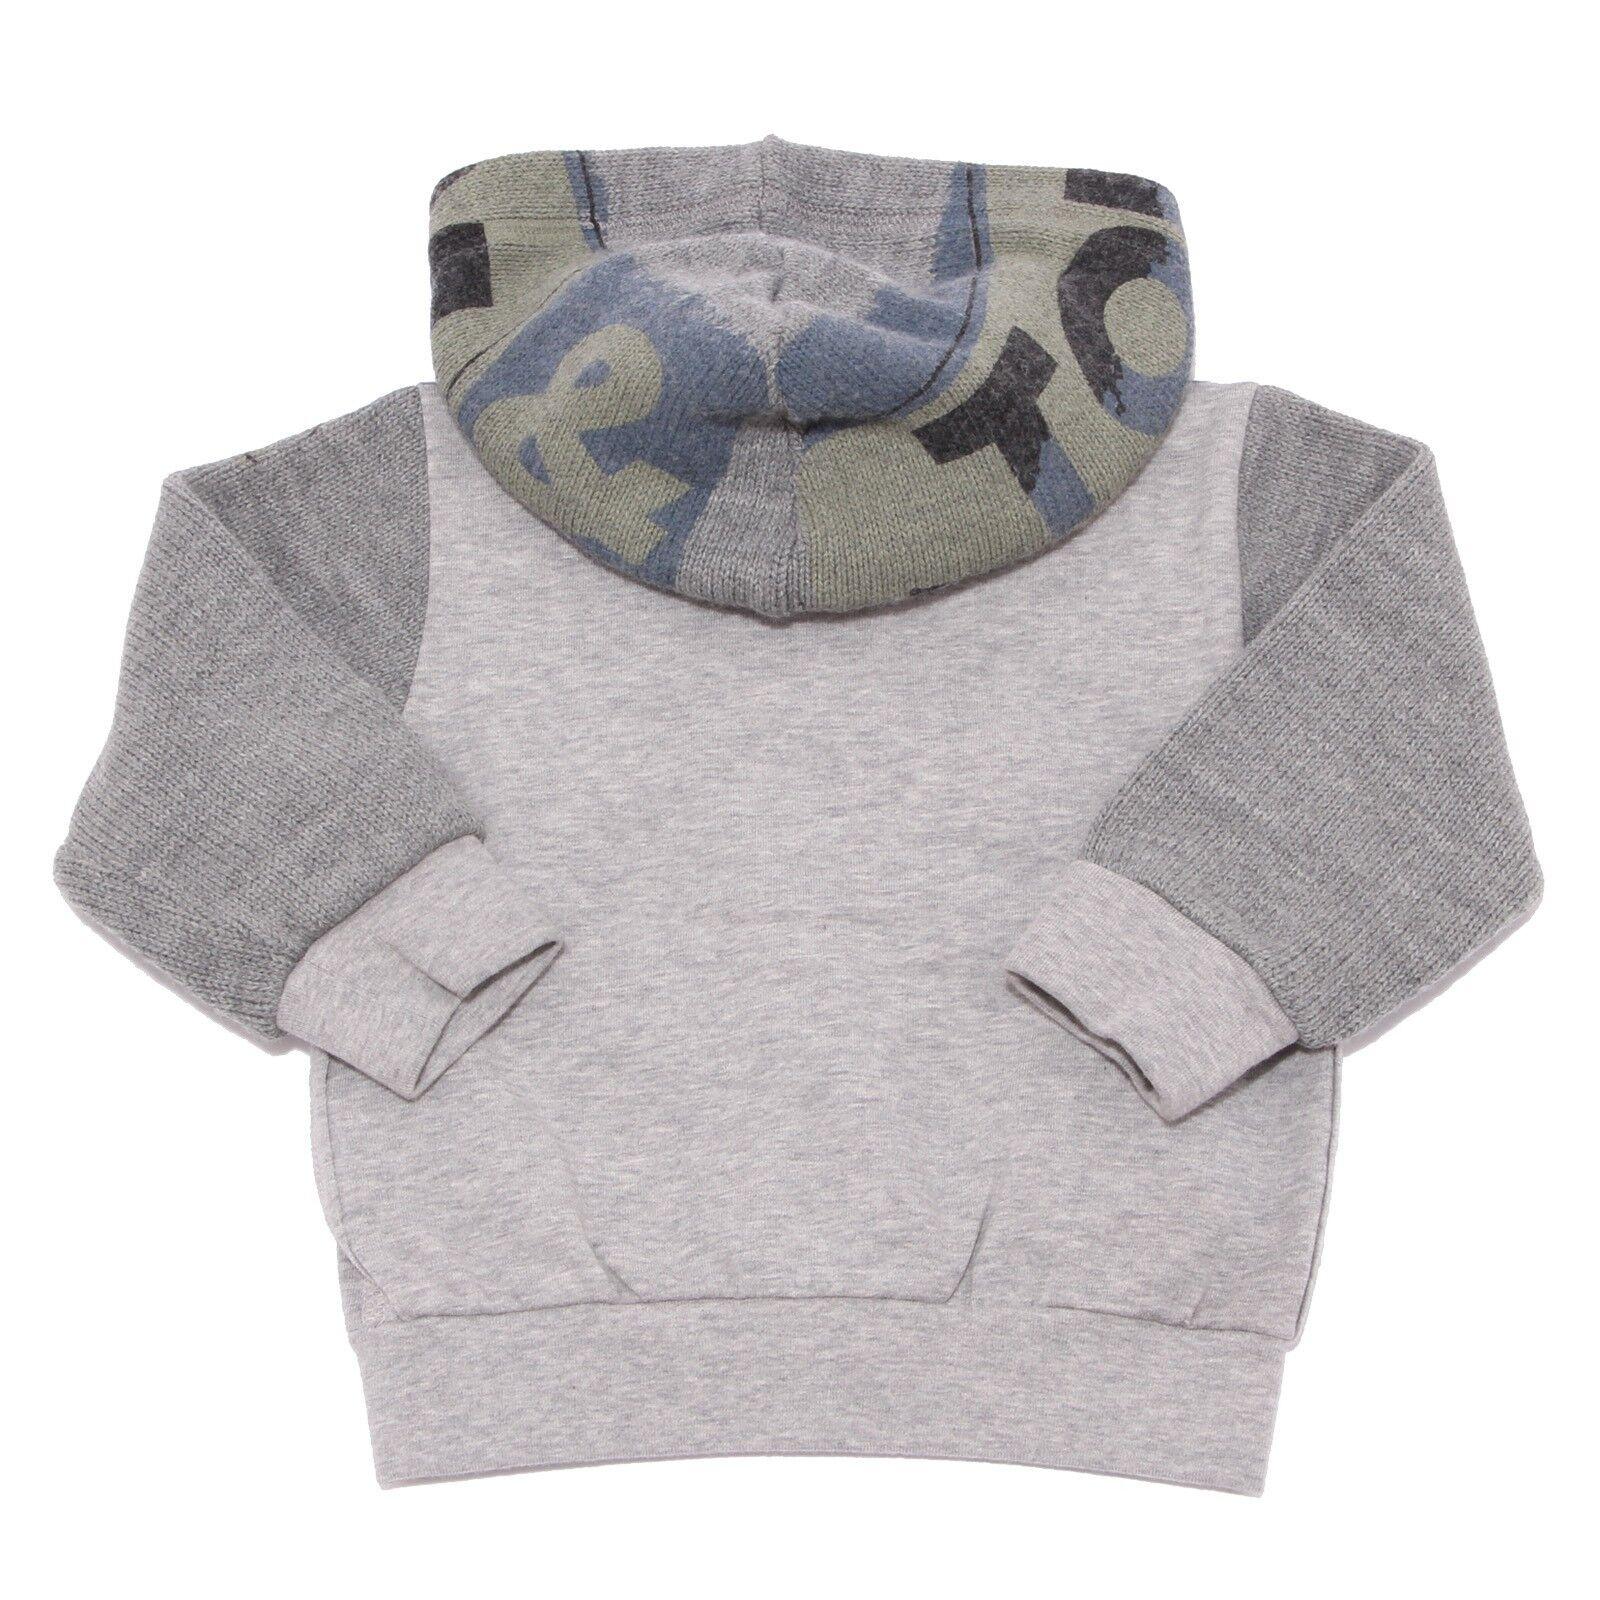 6023R felpa bimbo bimbo bimbo DOLCE & GABBANA grigio/verde sweatshirt kid 4f4e5a